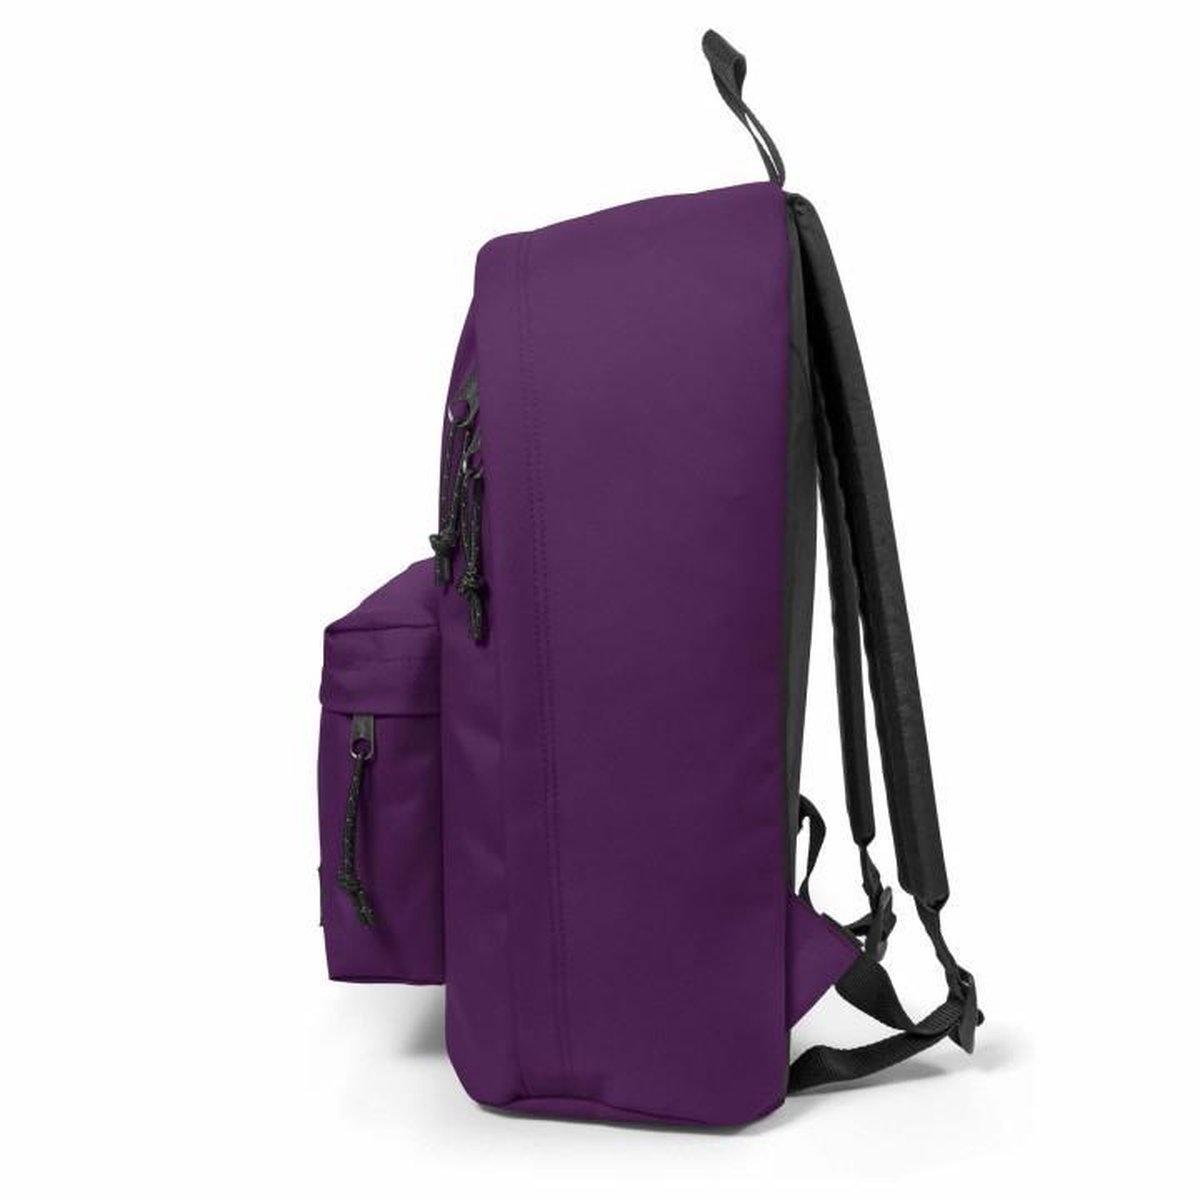 Eastpak Eastpak Out Of Office Power Purple 15 inch laptop rugtas